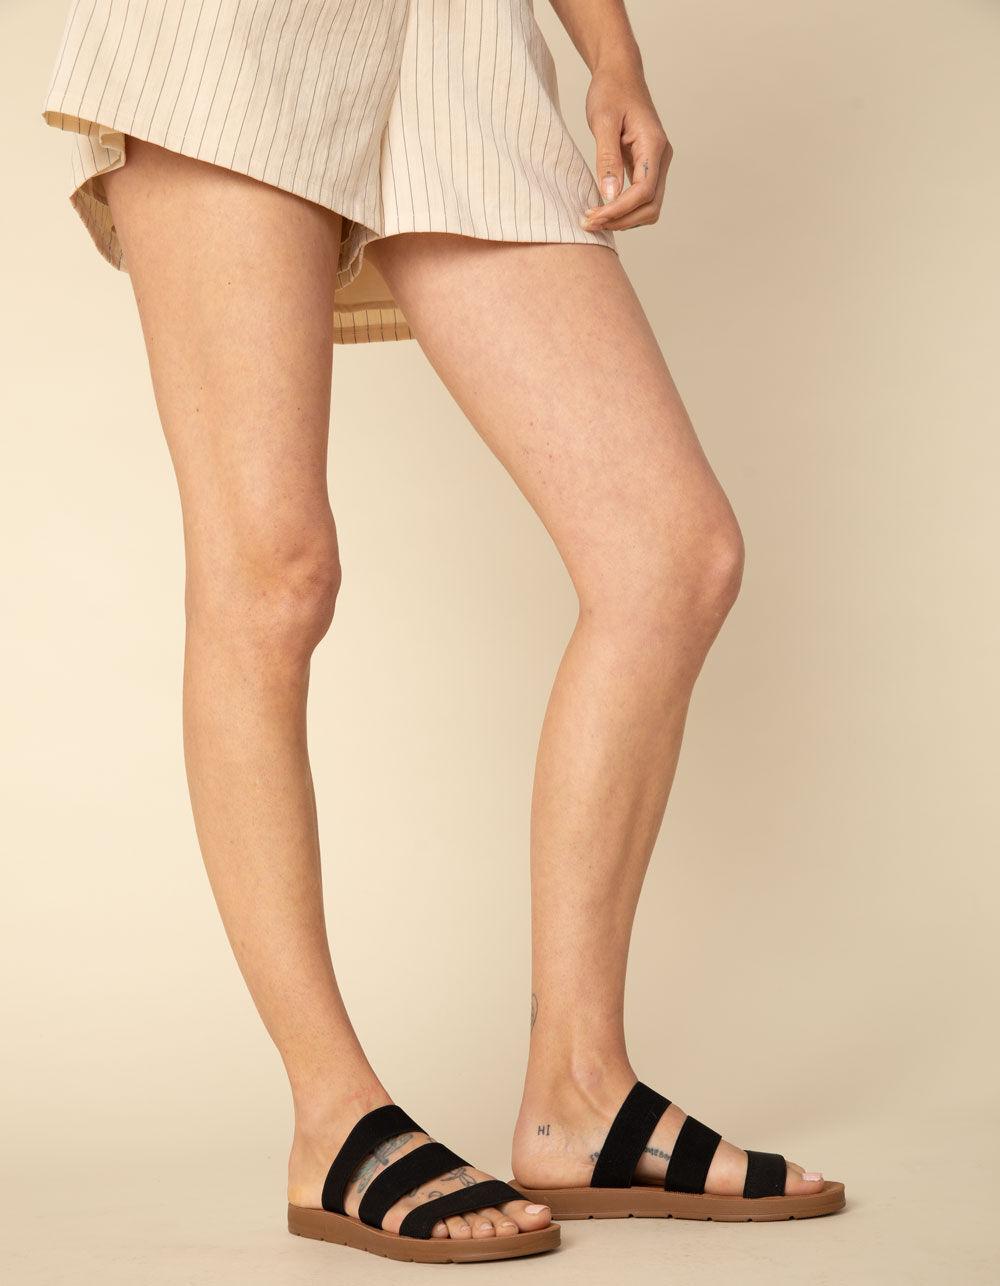 STEVE MADDEN Pascale Black Sandals